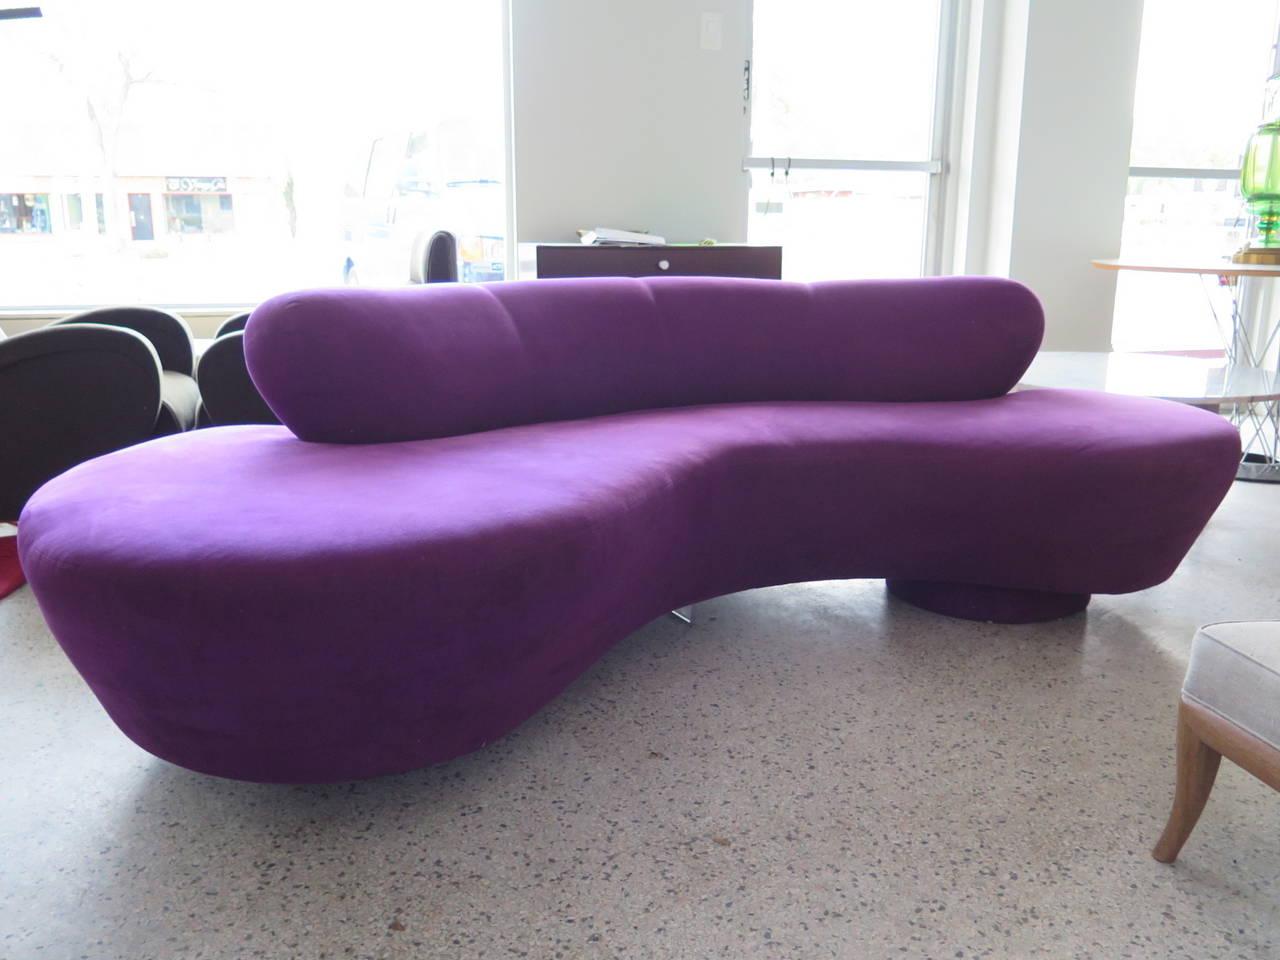 Ordinaire A Classic Vladimir Kagan Cloud Sofa In Original Lilac Or Purple Ultrasuede.  Label Intact.